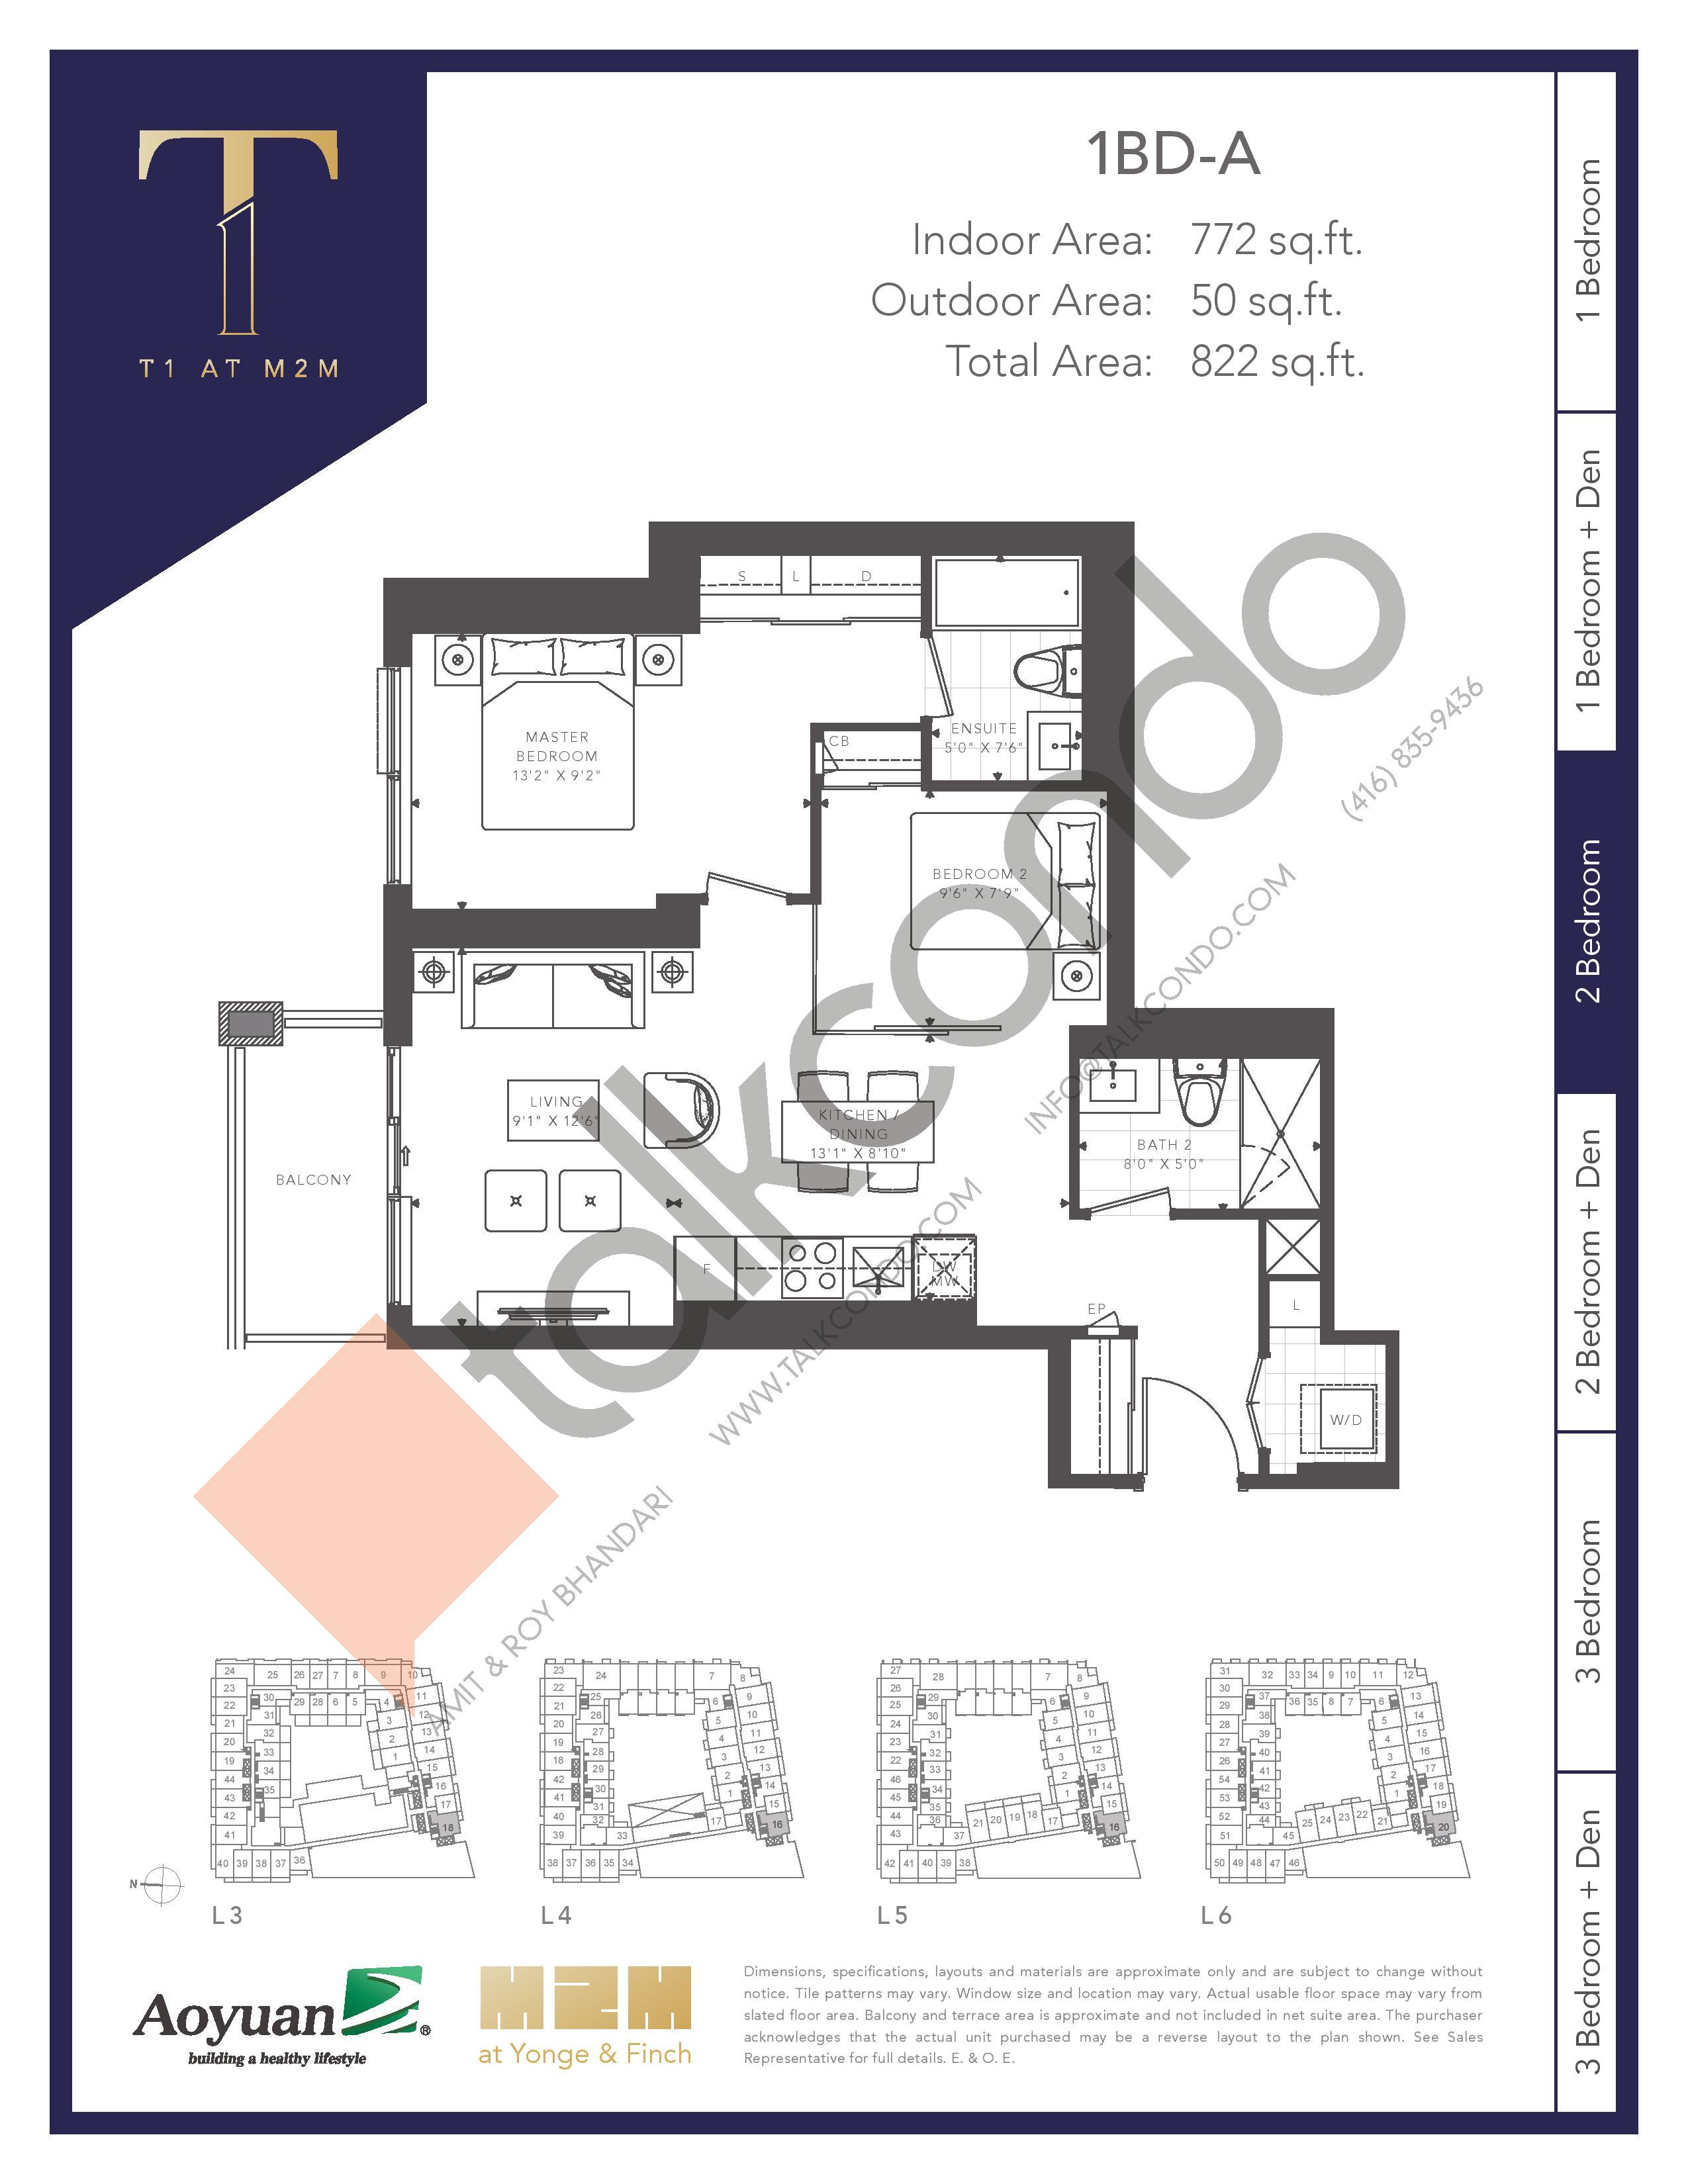 1BD-A (Tower) Floor Plan at T1 at M2M Condos - 772 sq.ft